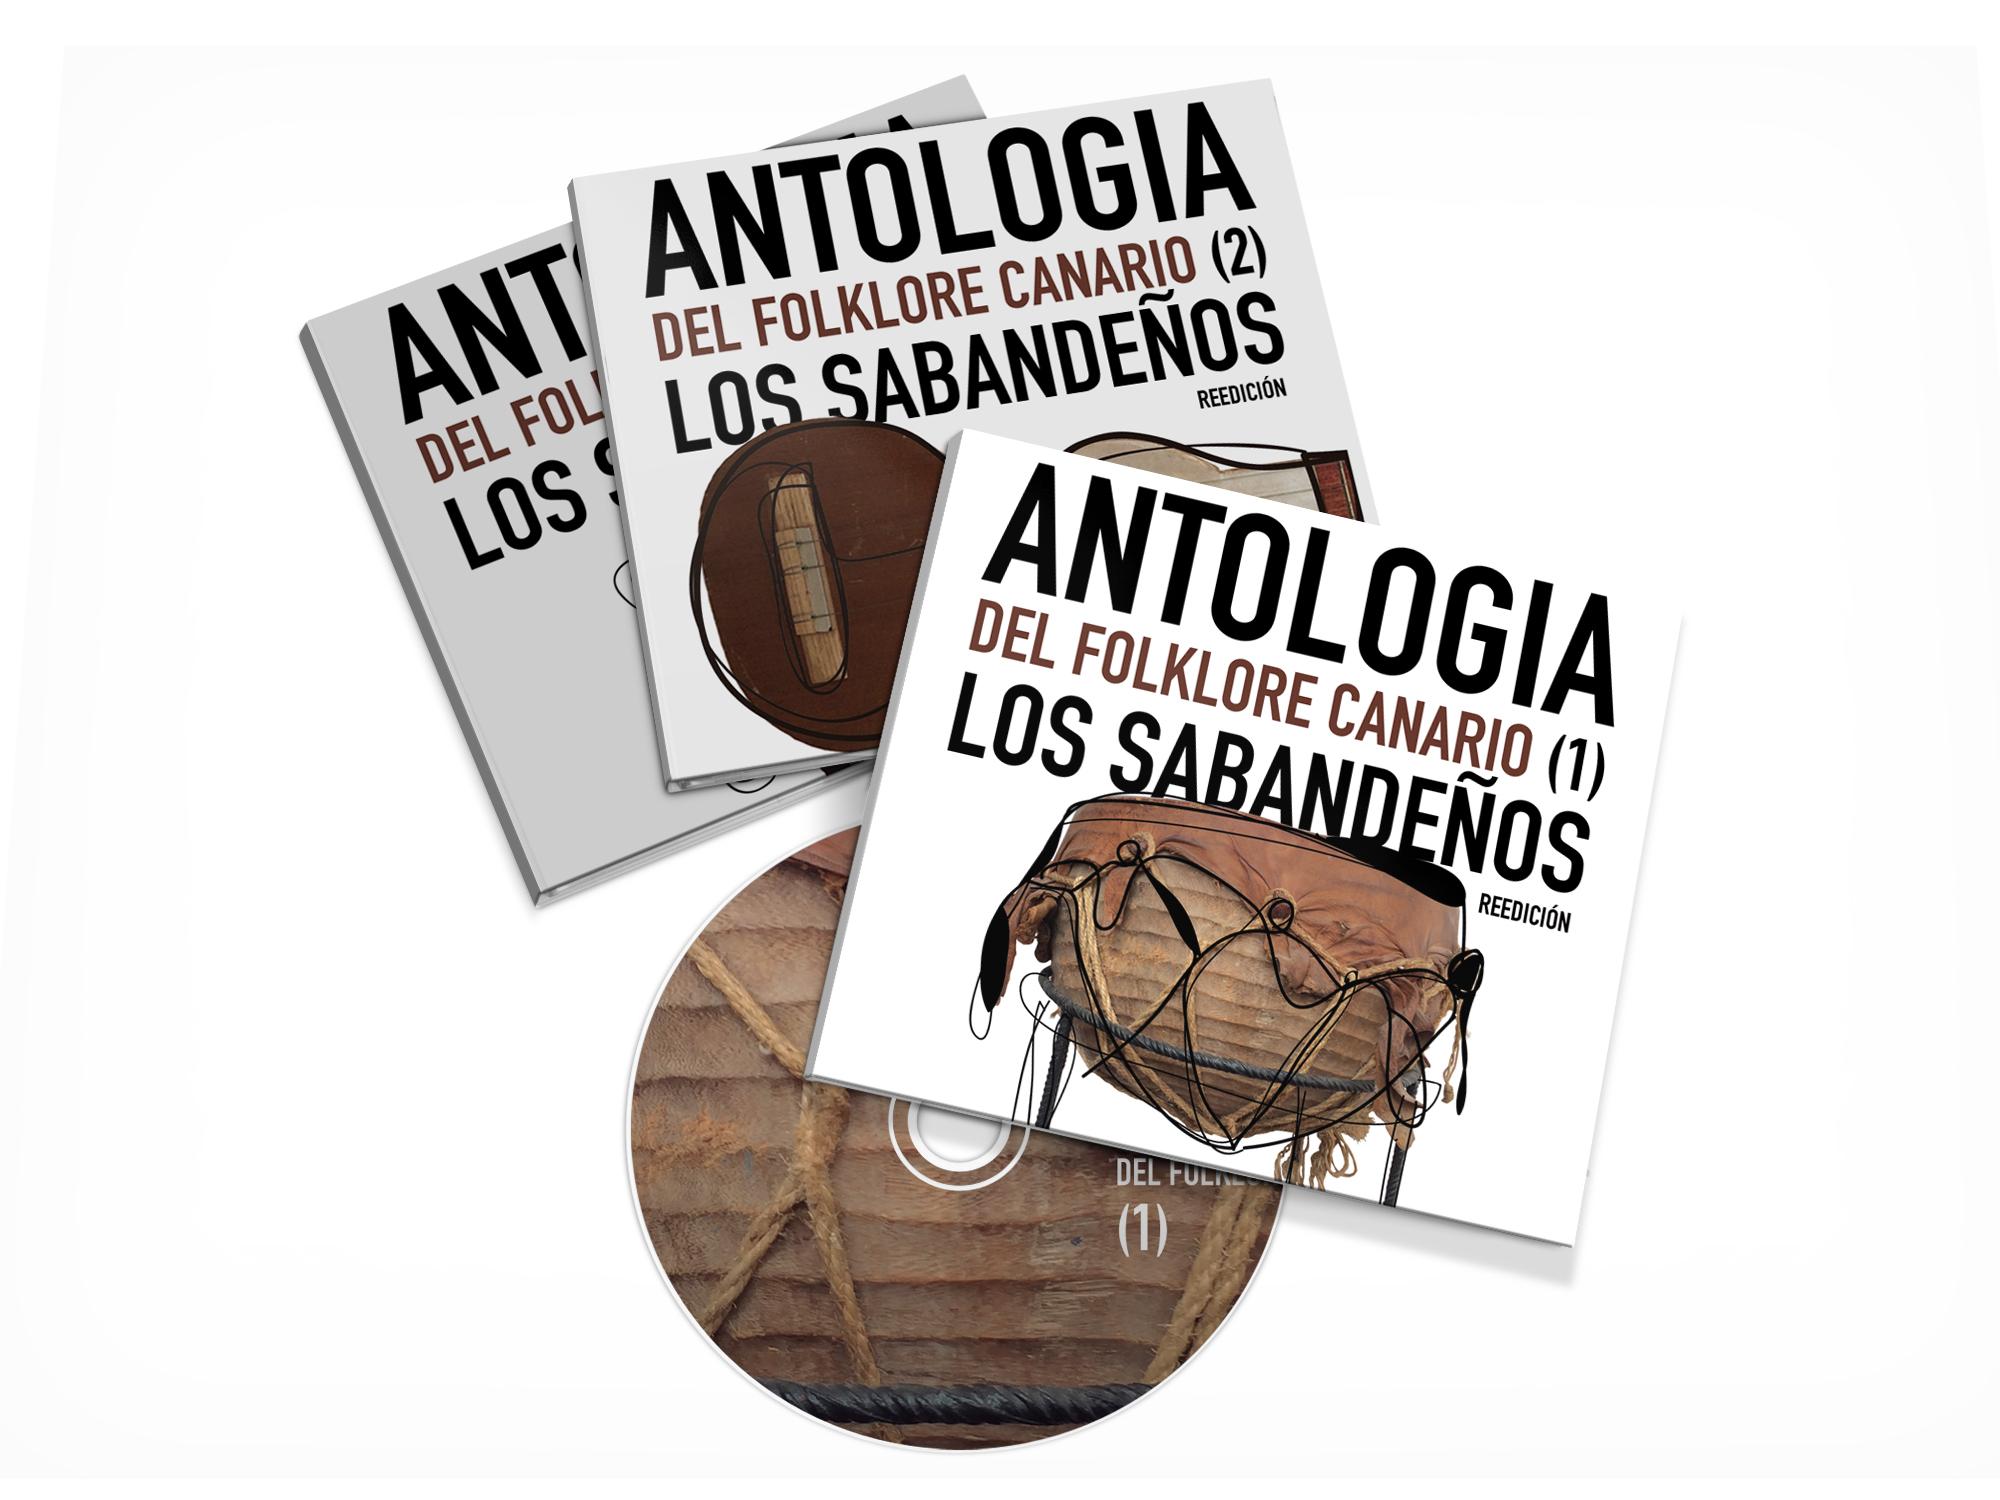 antologia_cds